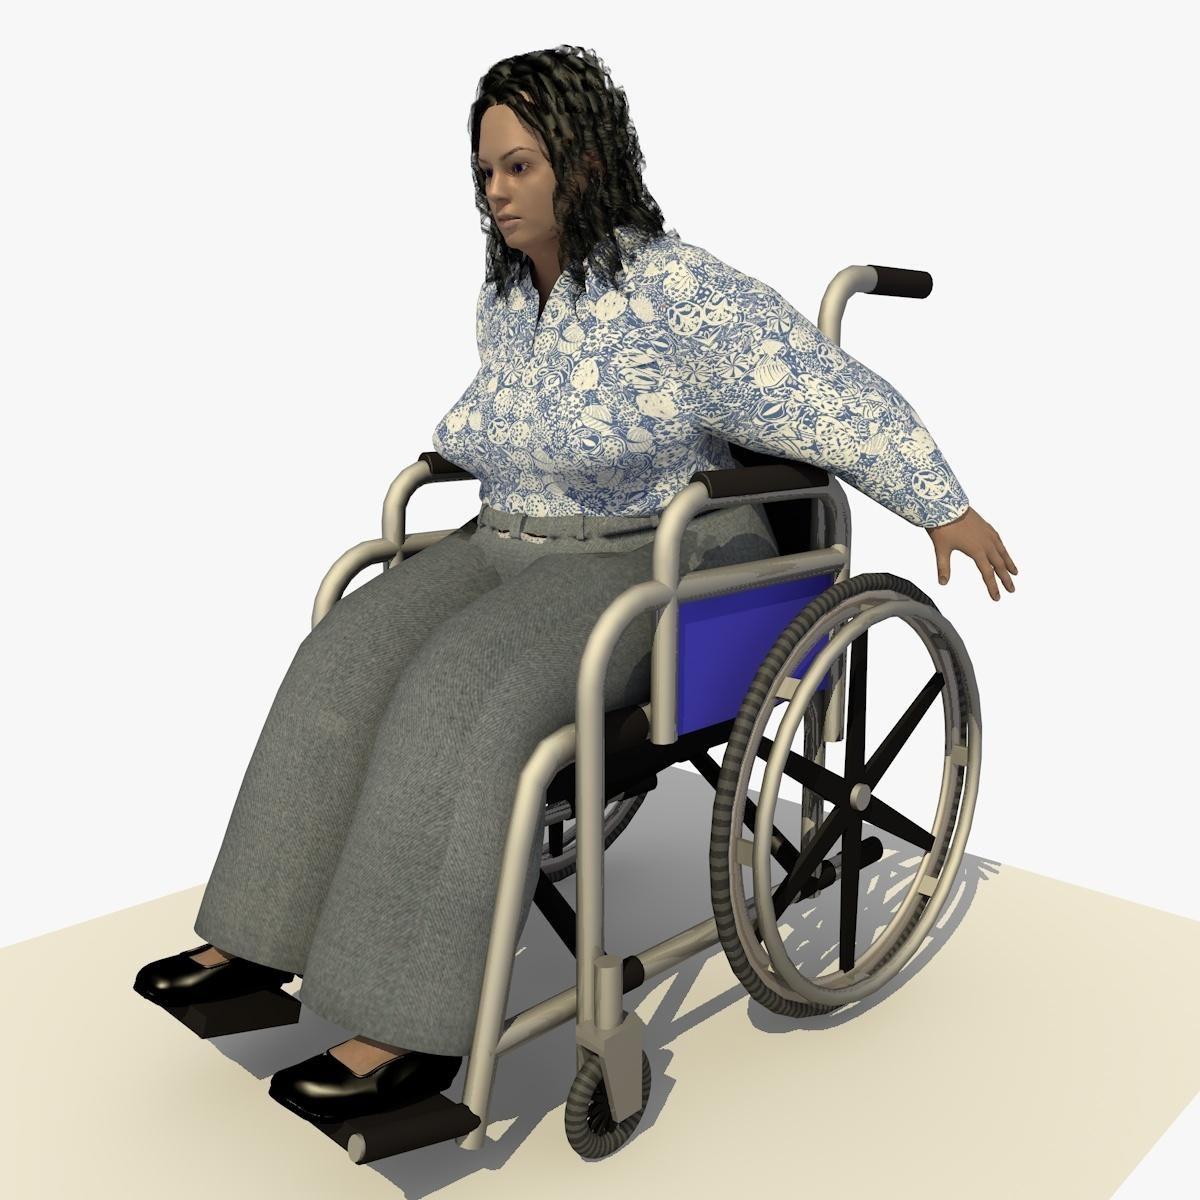 Animated Disabled European Woman In A Wheel Chair 3d Model Ad European Disabled Animated Woman European Women Women Model